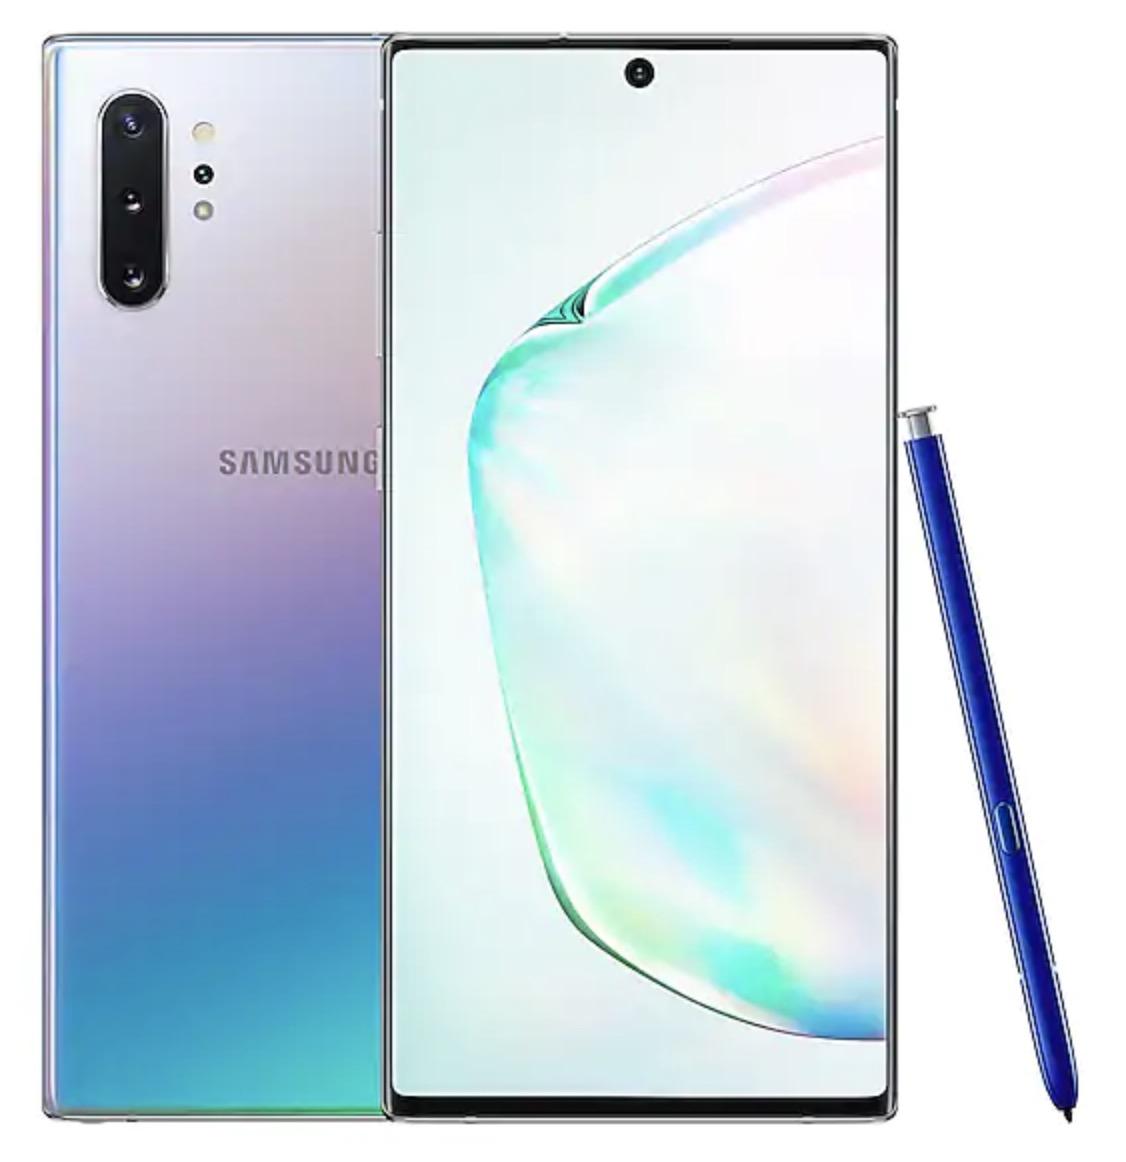 Code promo Rakuten : 1 smartphone Samsung Galaxy Note10 256Go à gagner